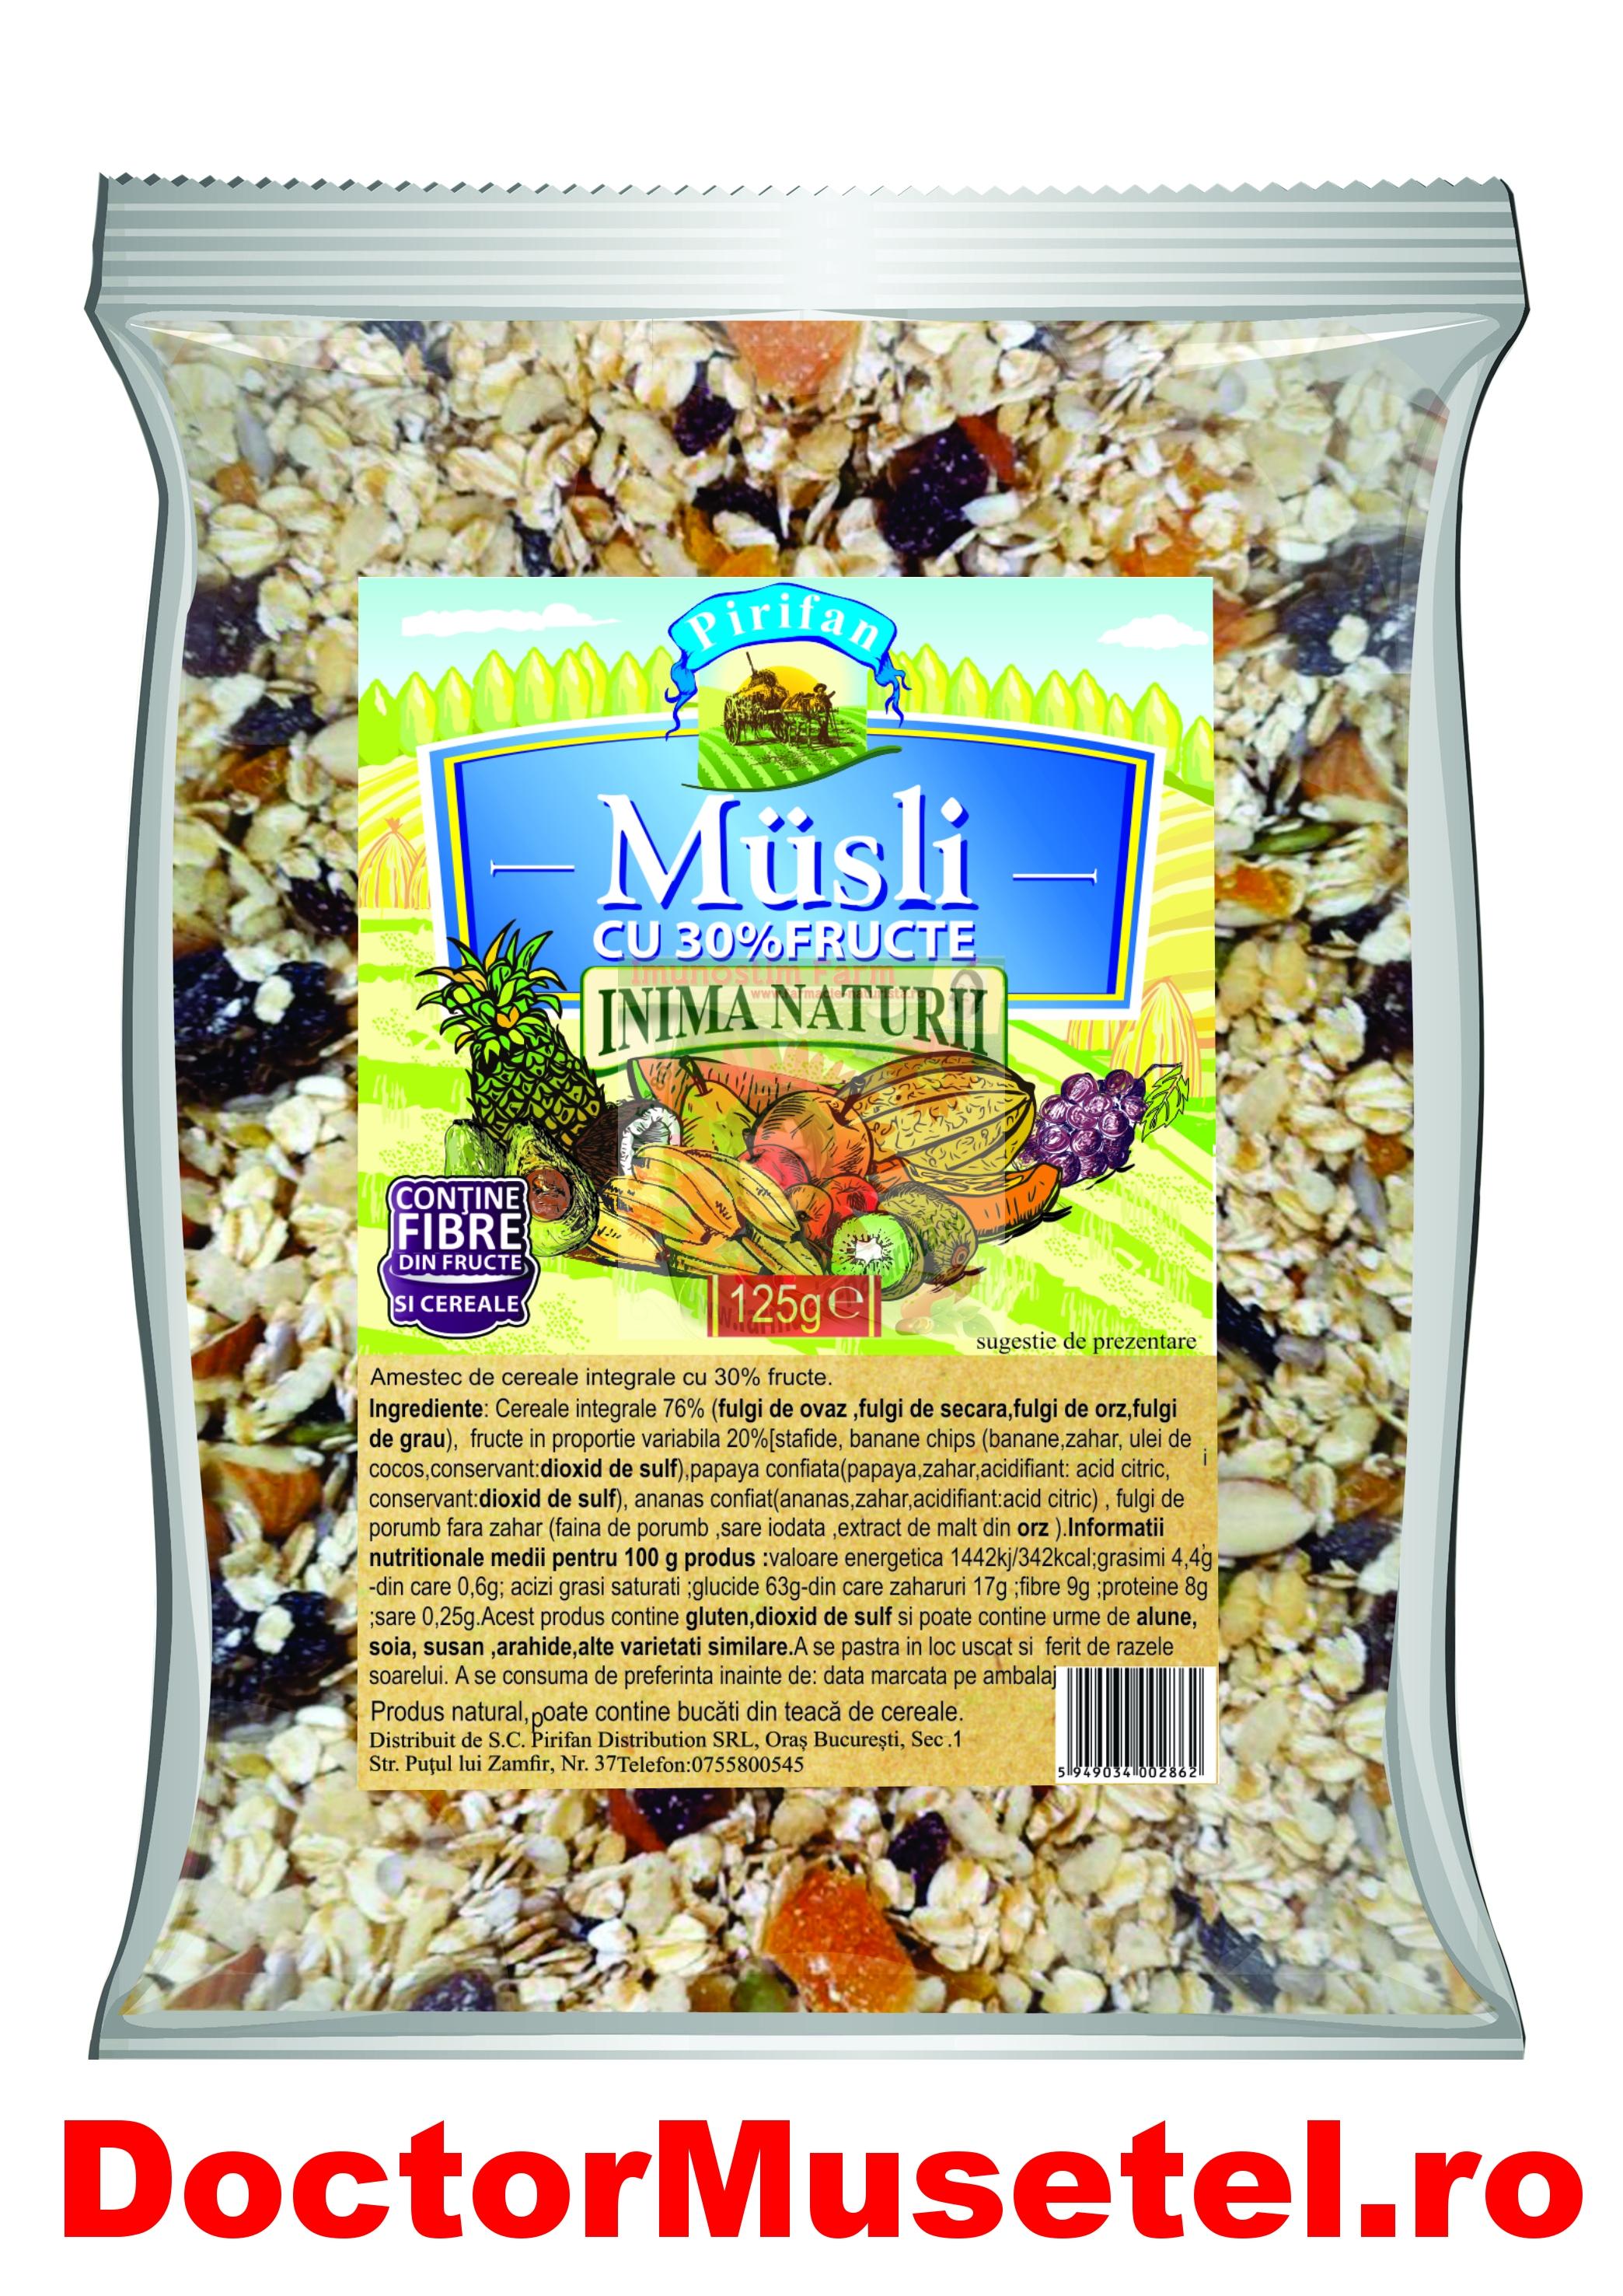 Musli-30---fructe-125g-PIRIFAN-www-farmacie-naturista-ro.jpg